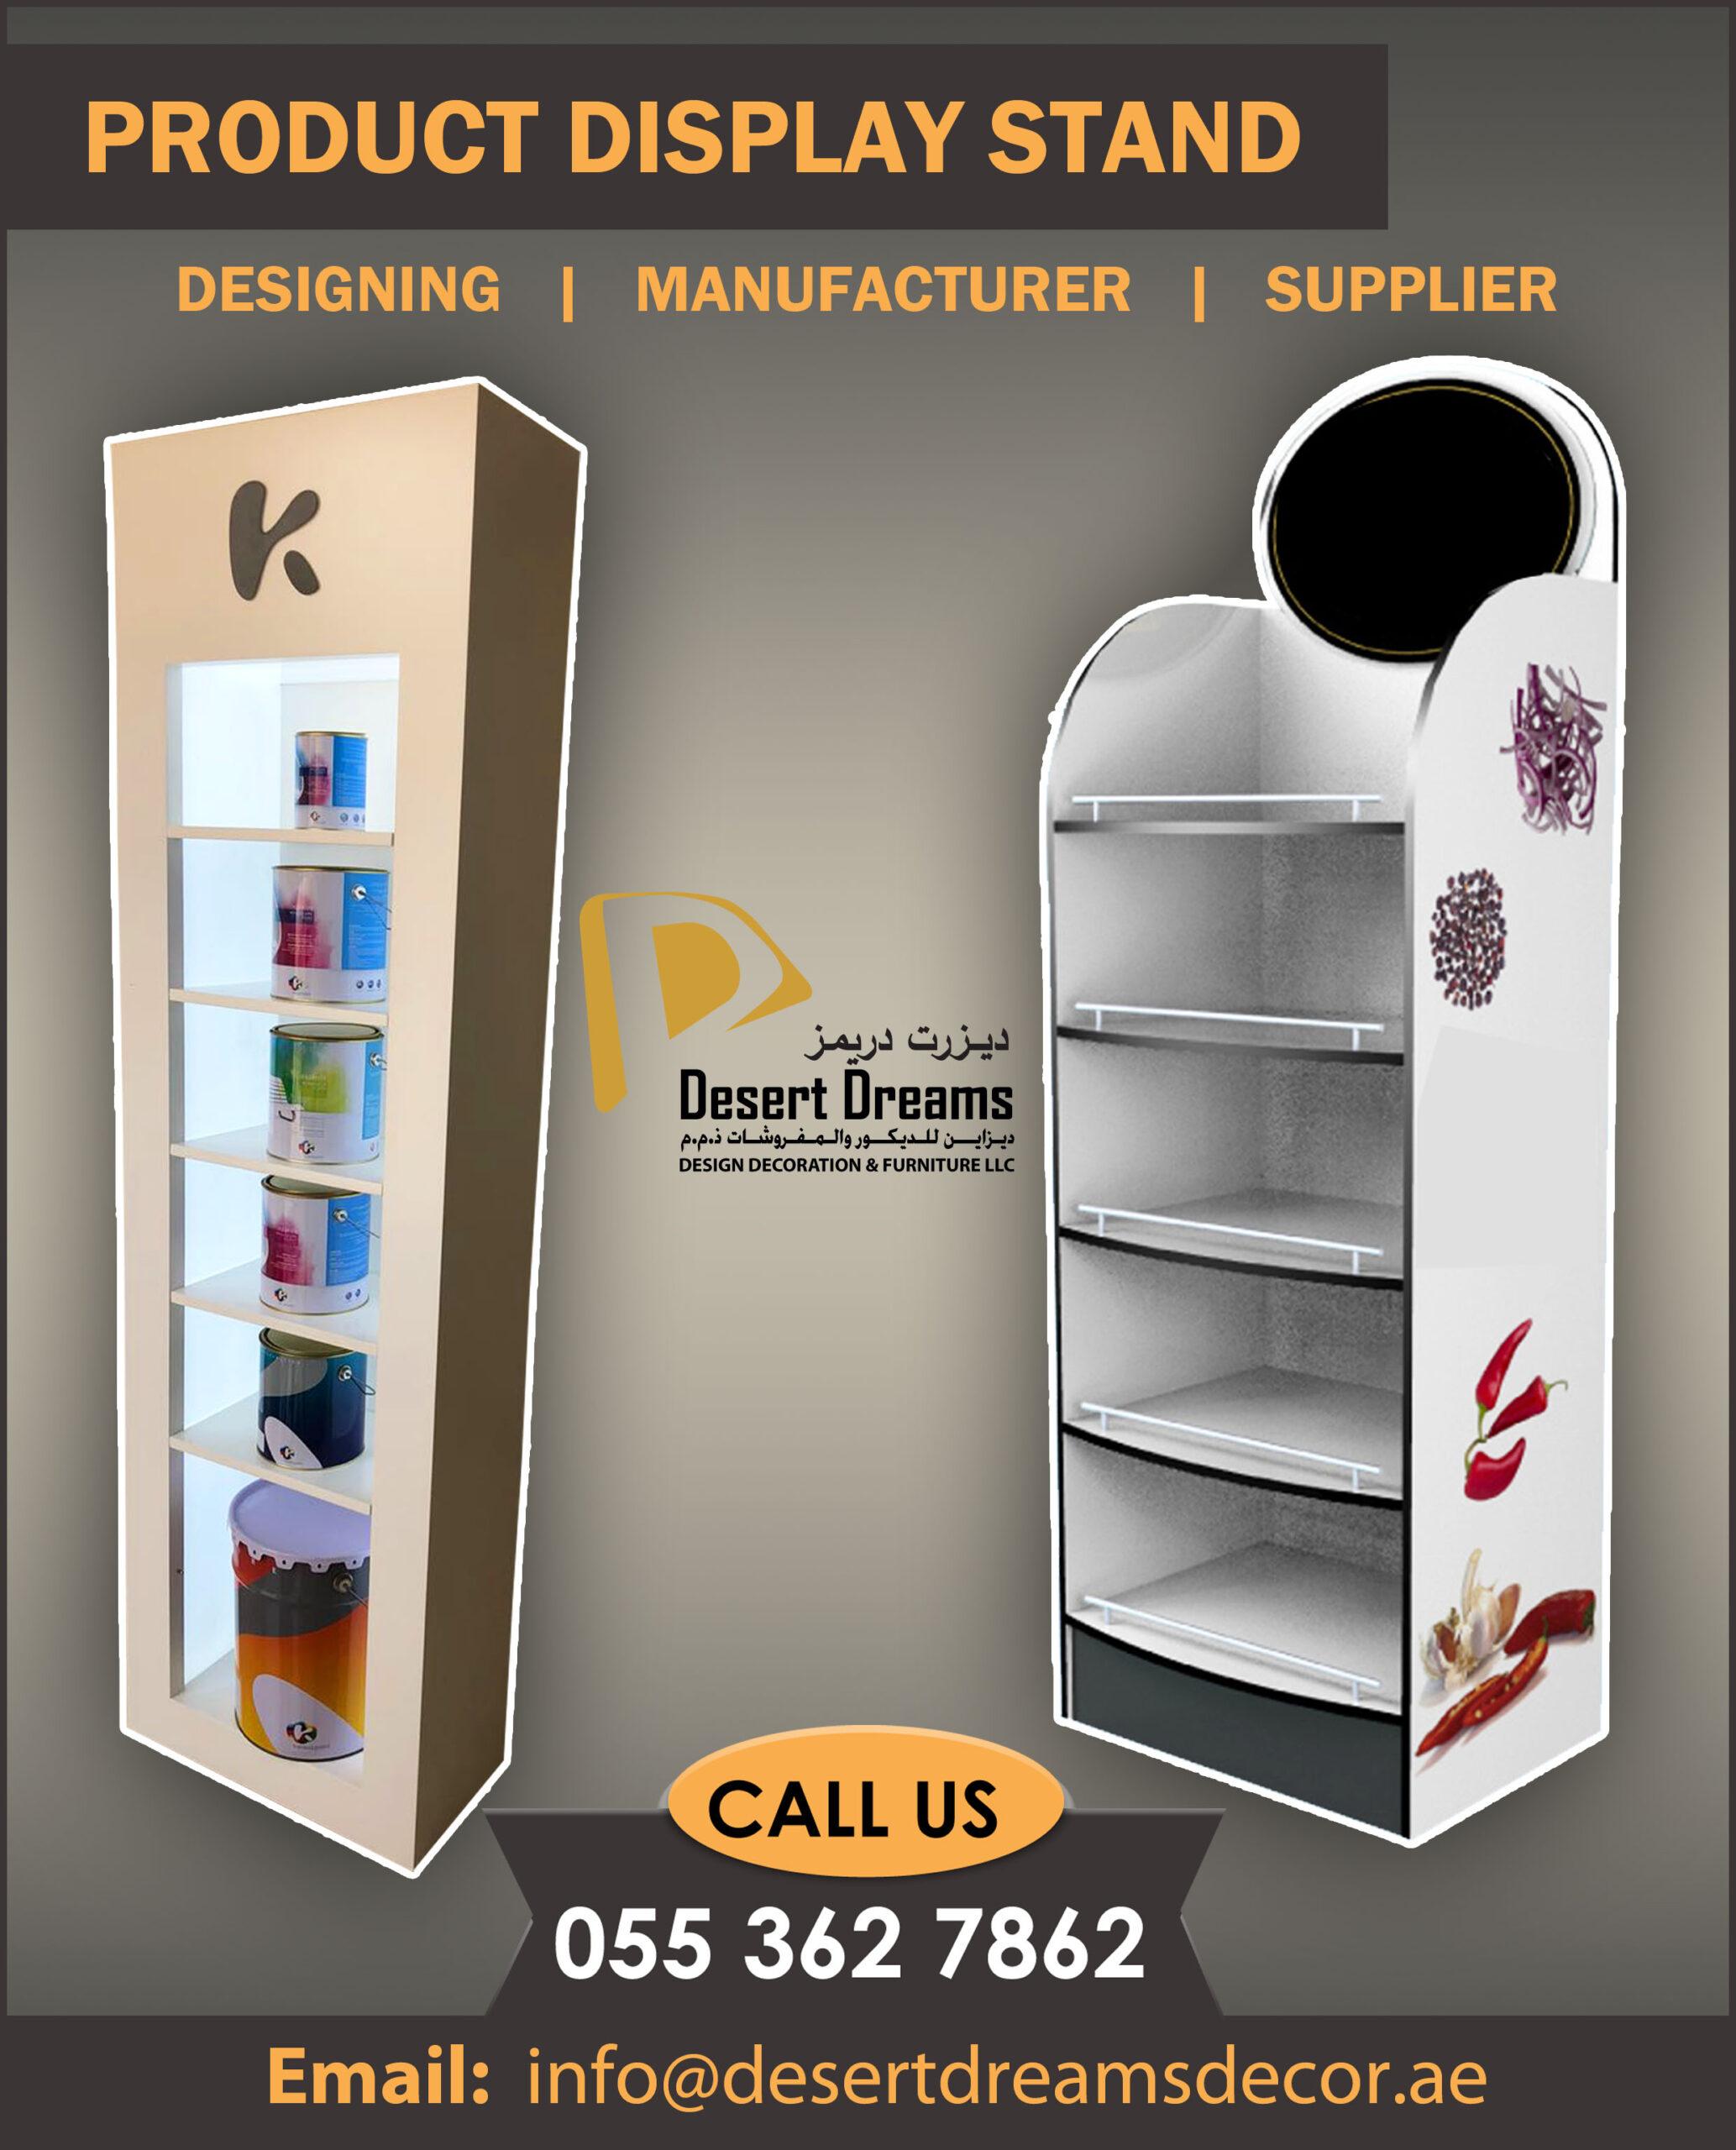 0553627862-Books Display Stands in UAE-5 (3).jpg